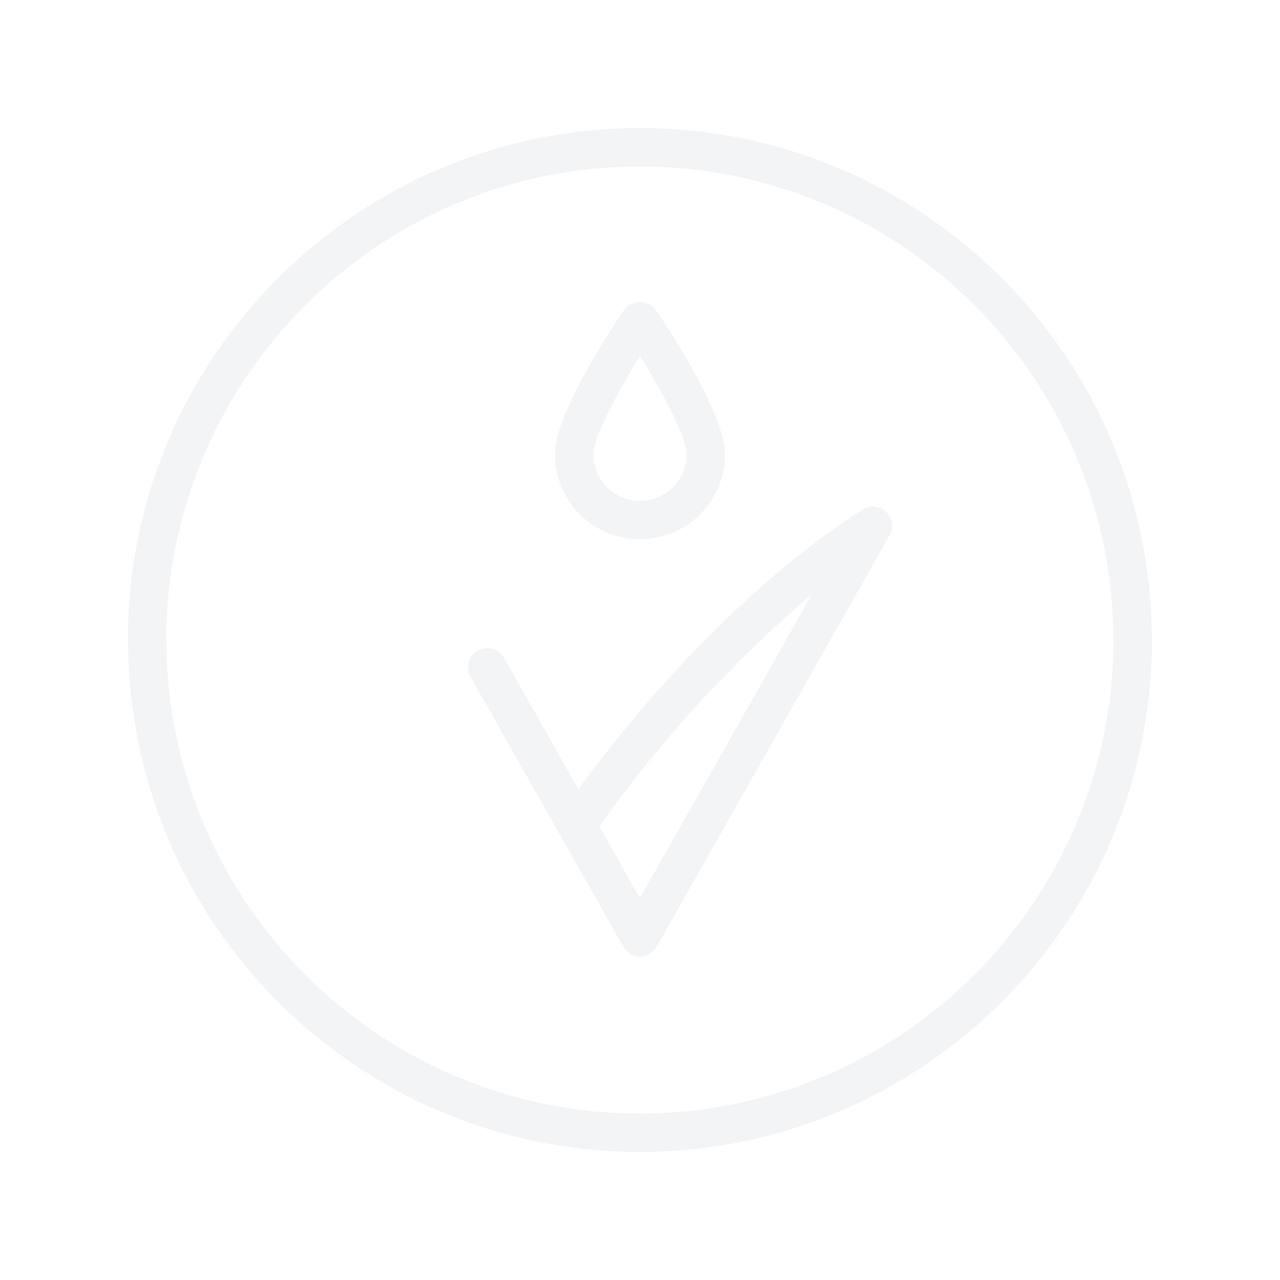 GLO SKIN BEAUTY Brow Quad Kit 4.15g